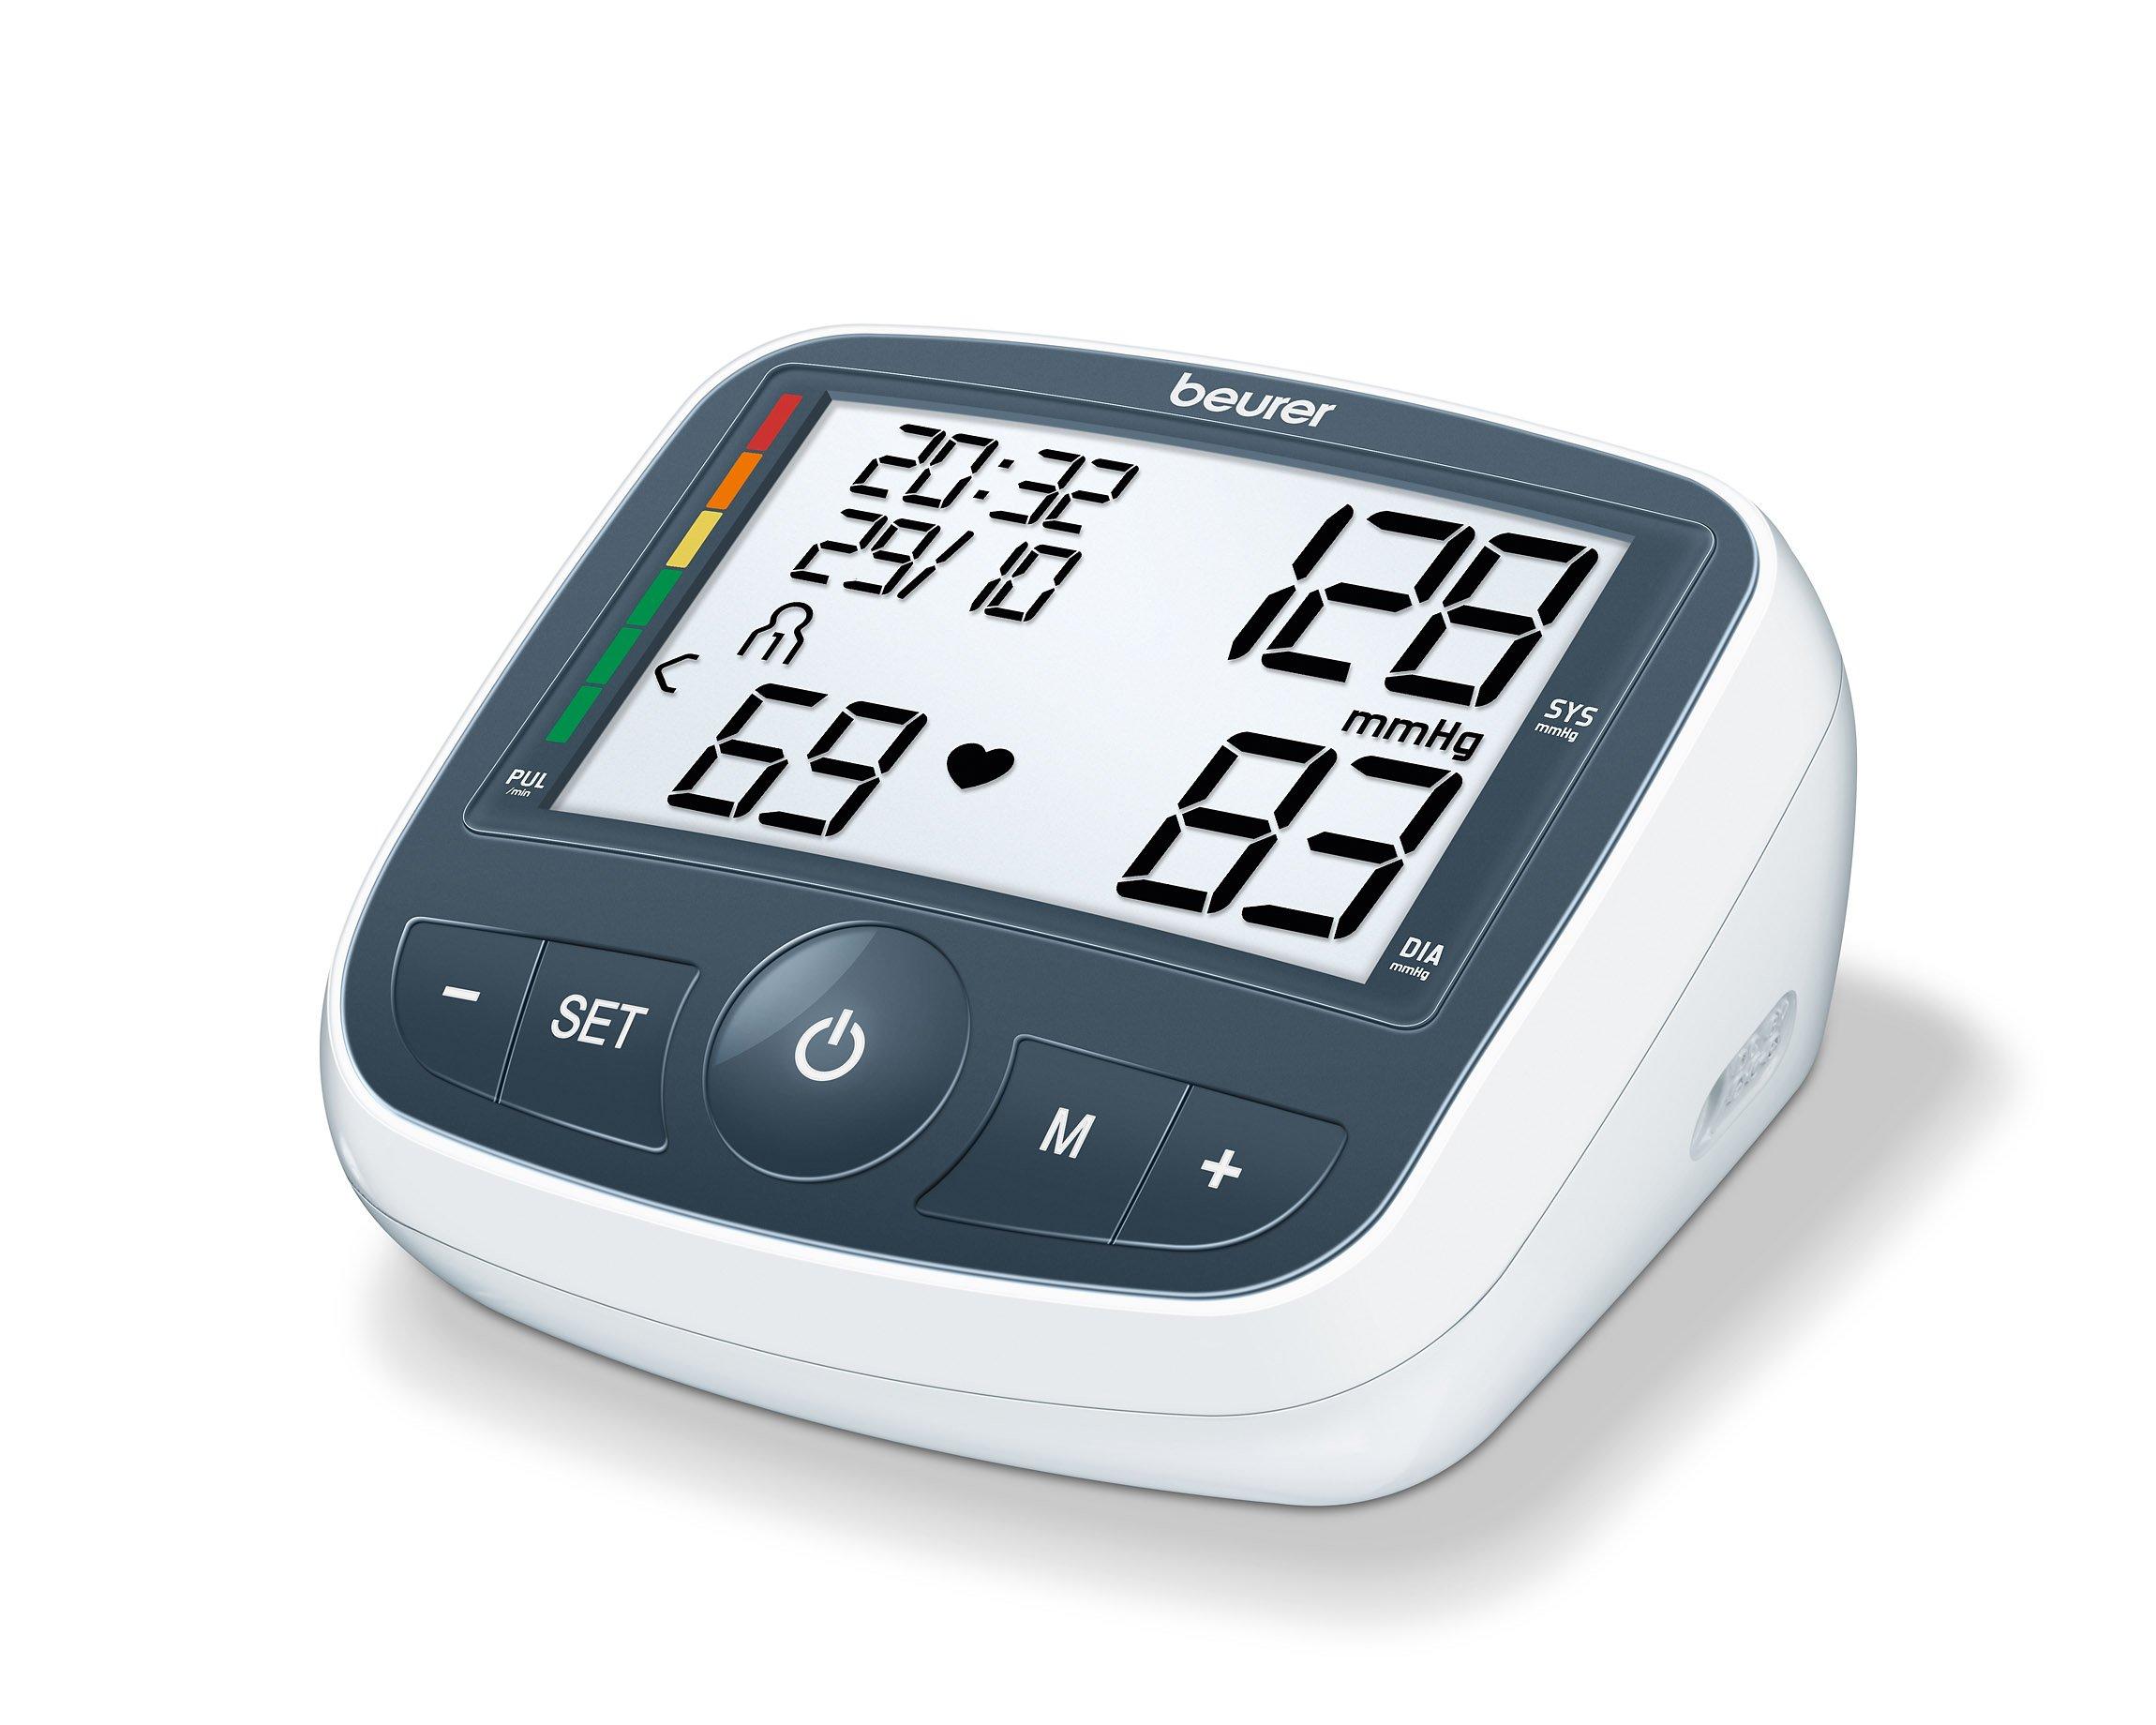 Beurer - BM 40 Blood Pressure Monitor - 3 Years warranty